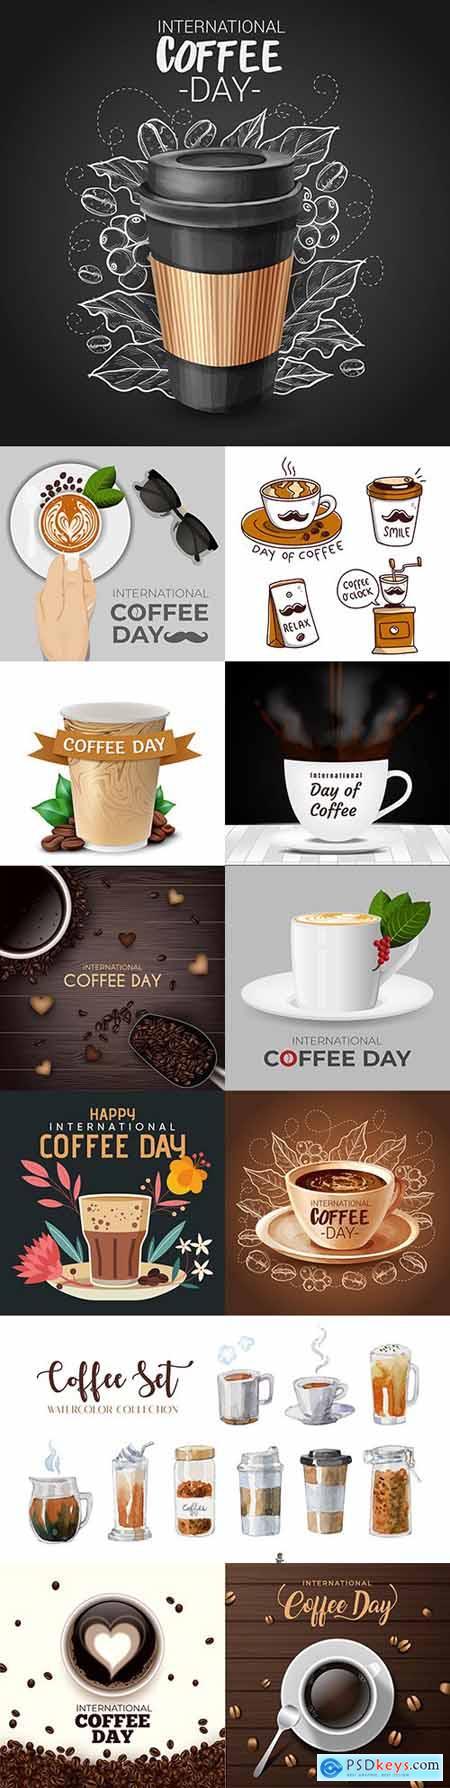 International coffee day with splashes and smoke